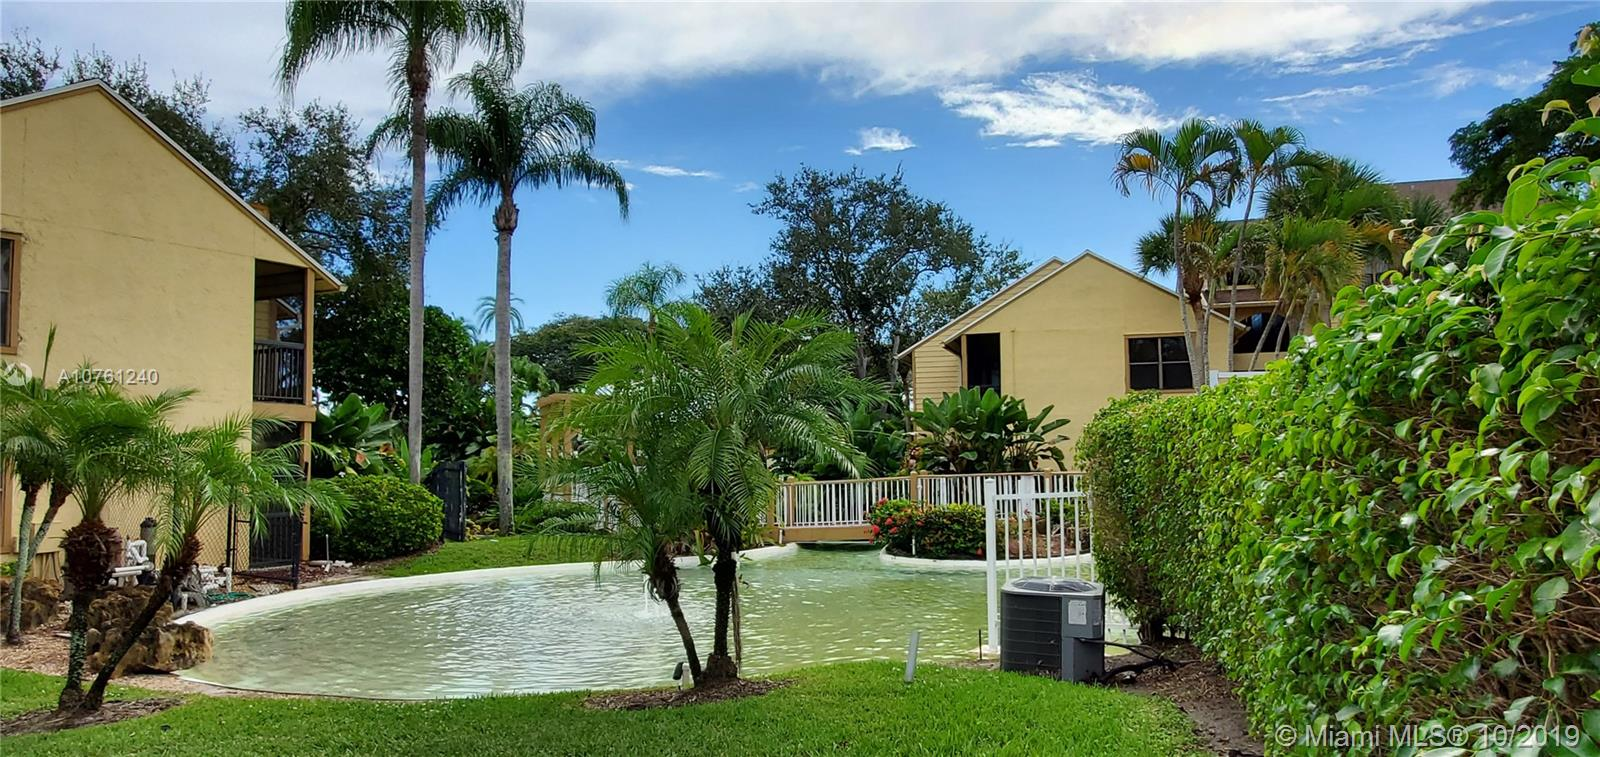 2311 N Congress Ave 12, Boynton Beach, FL 33426